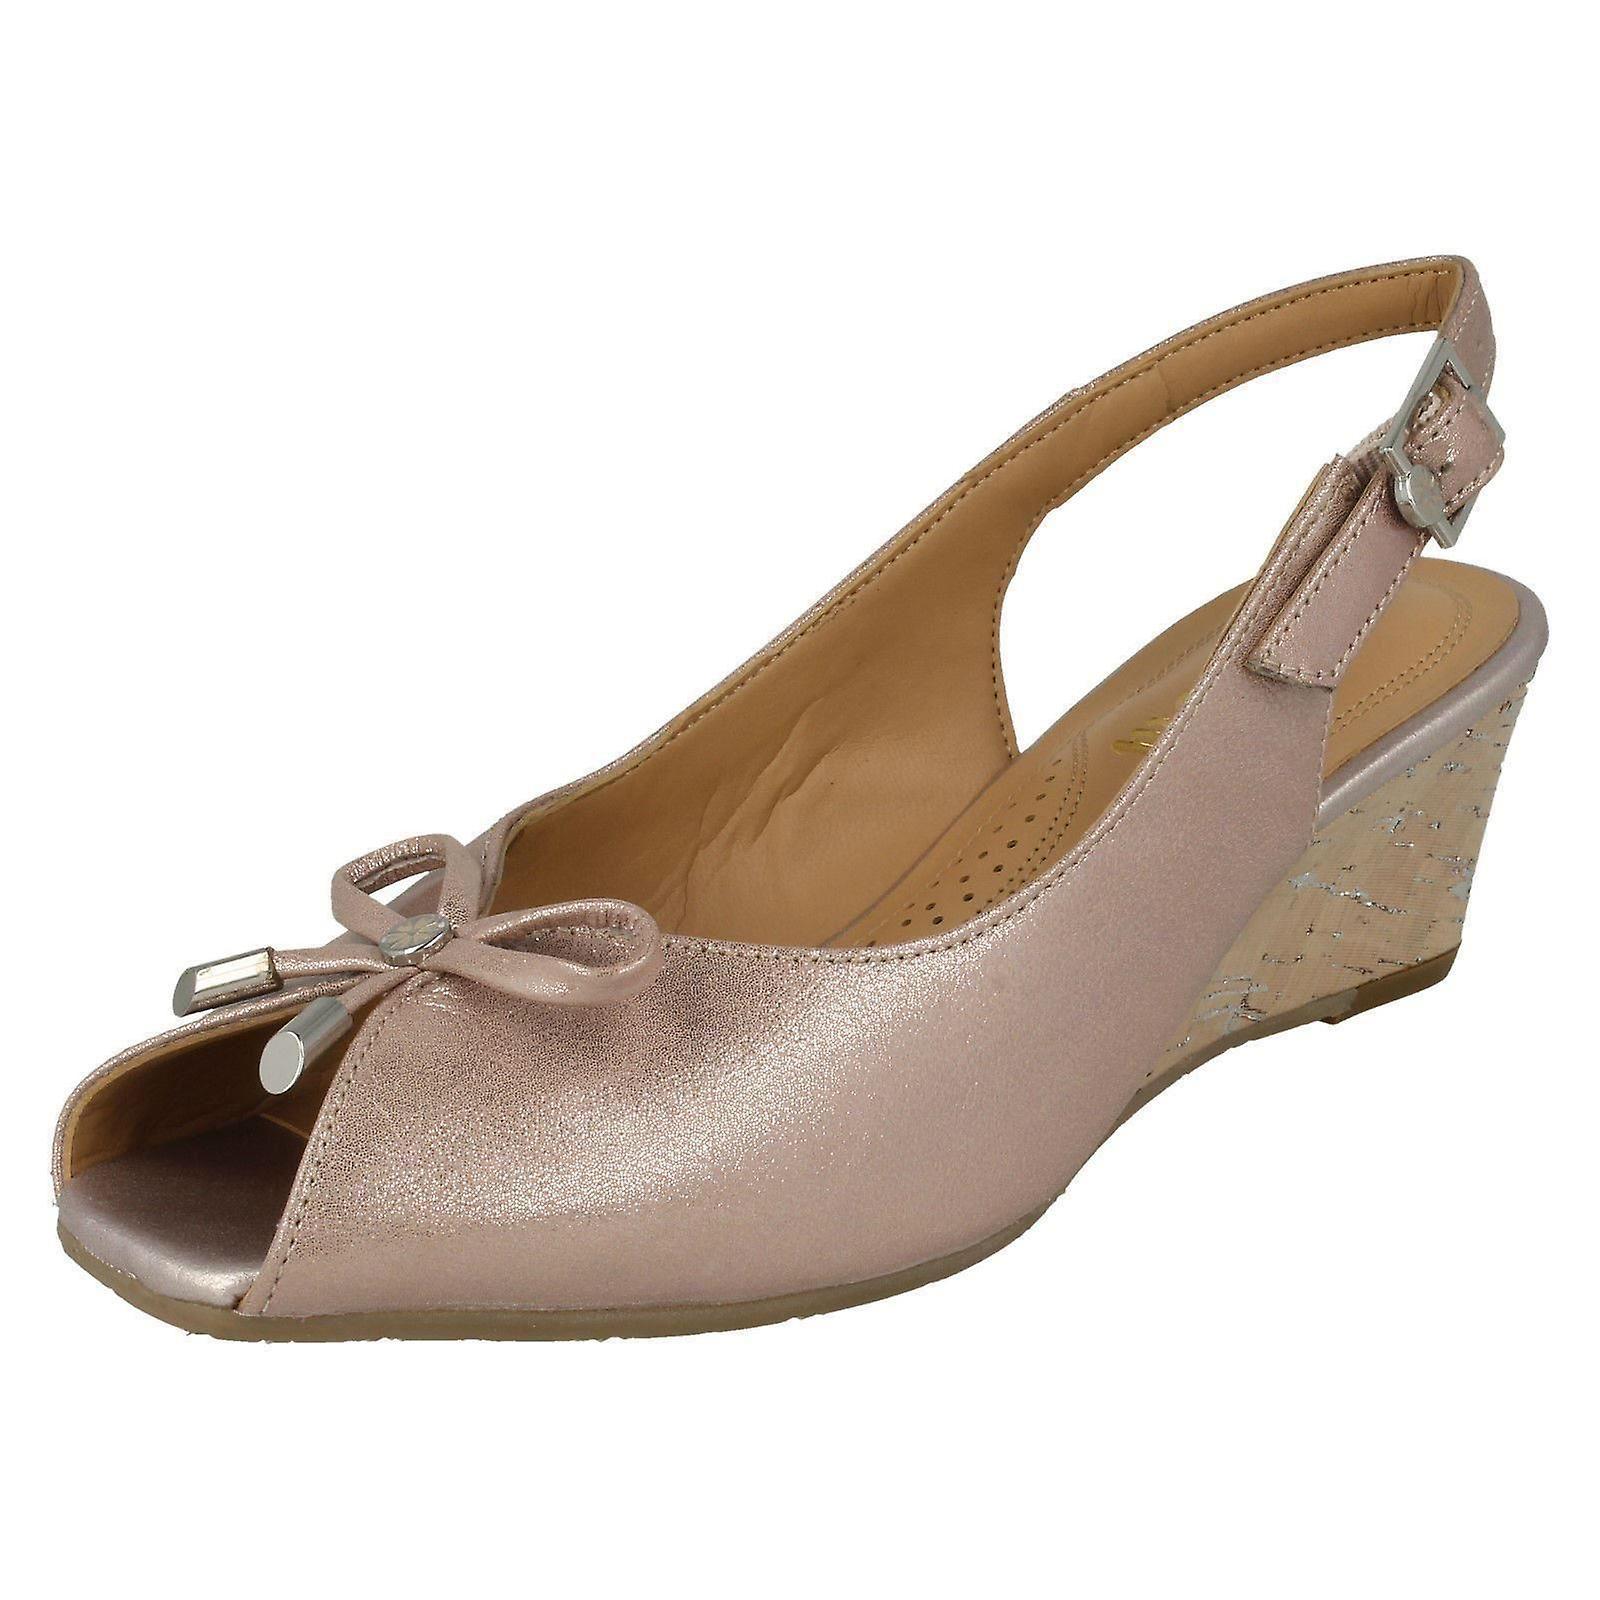 028edf1416e4c Ladies Van Dal Sling Back Wedge Open Toe Sandals Oxley | Fruugo